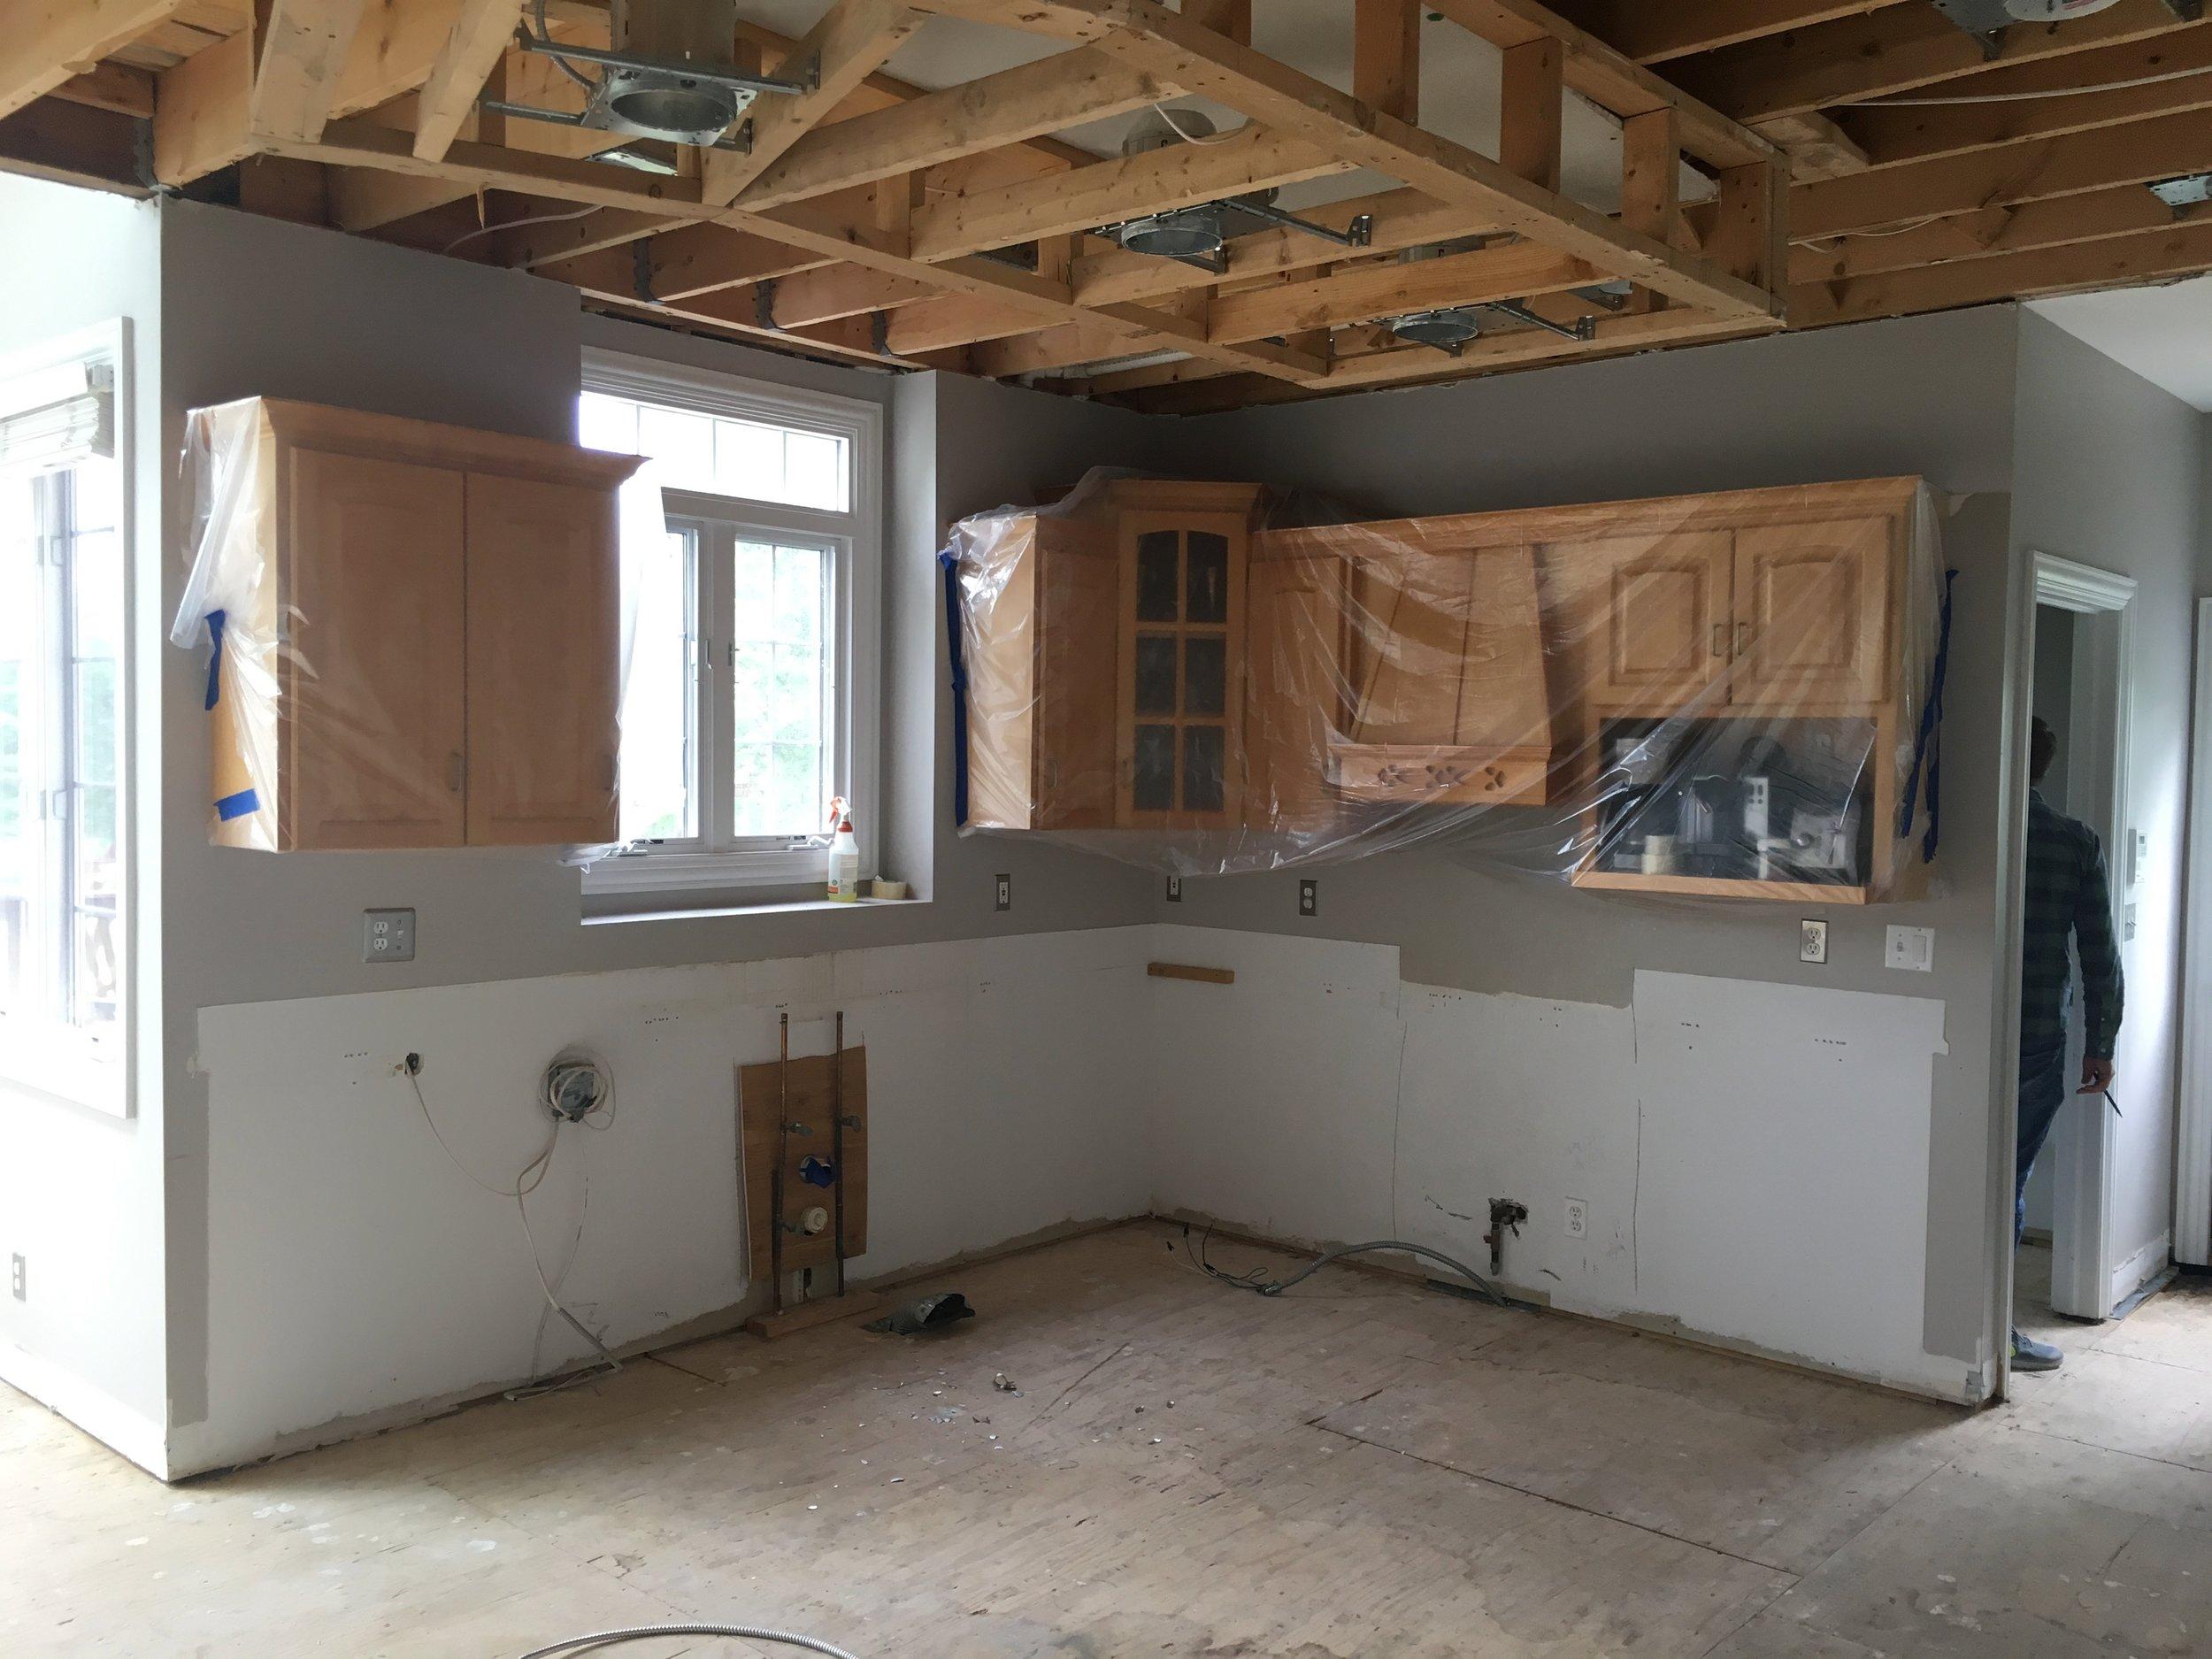 ILLINOIS KITCHEN & BATHROOM FLOOD DAMAGE REPAIR